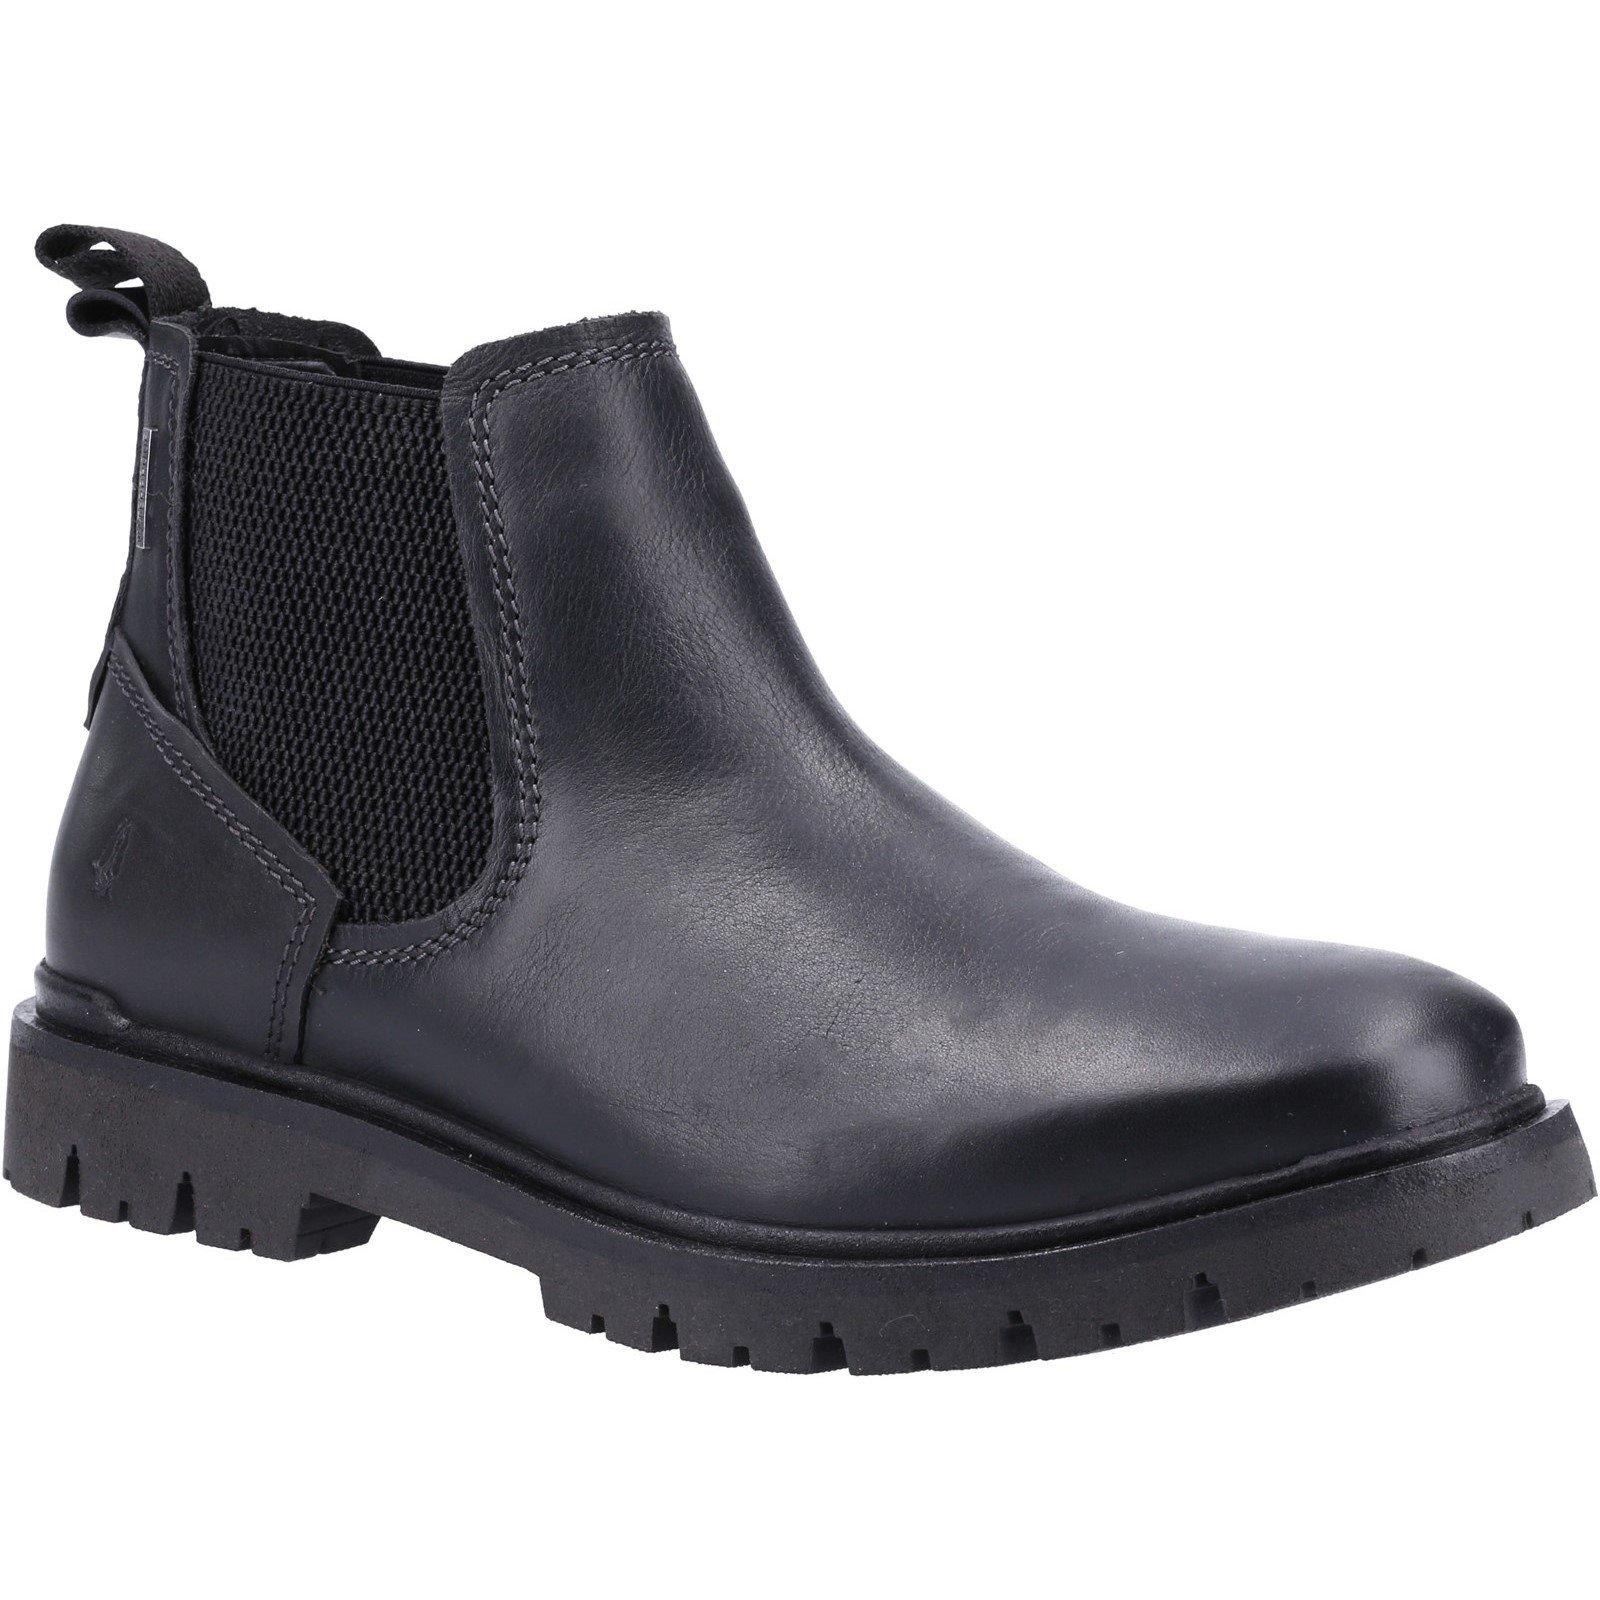 Hush Puppies Men's Paxton Chelsea Boot Various Colours 32882 - Black 6